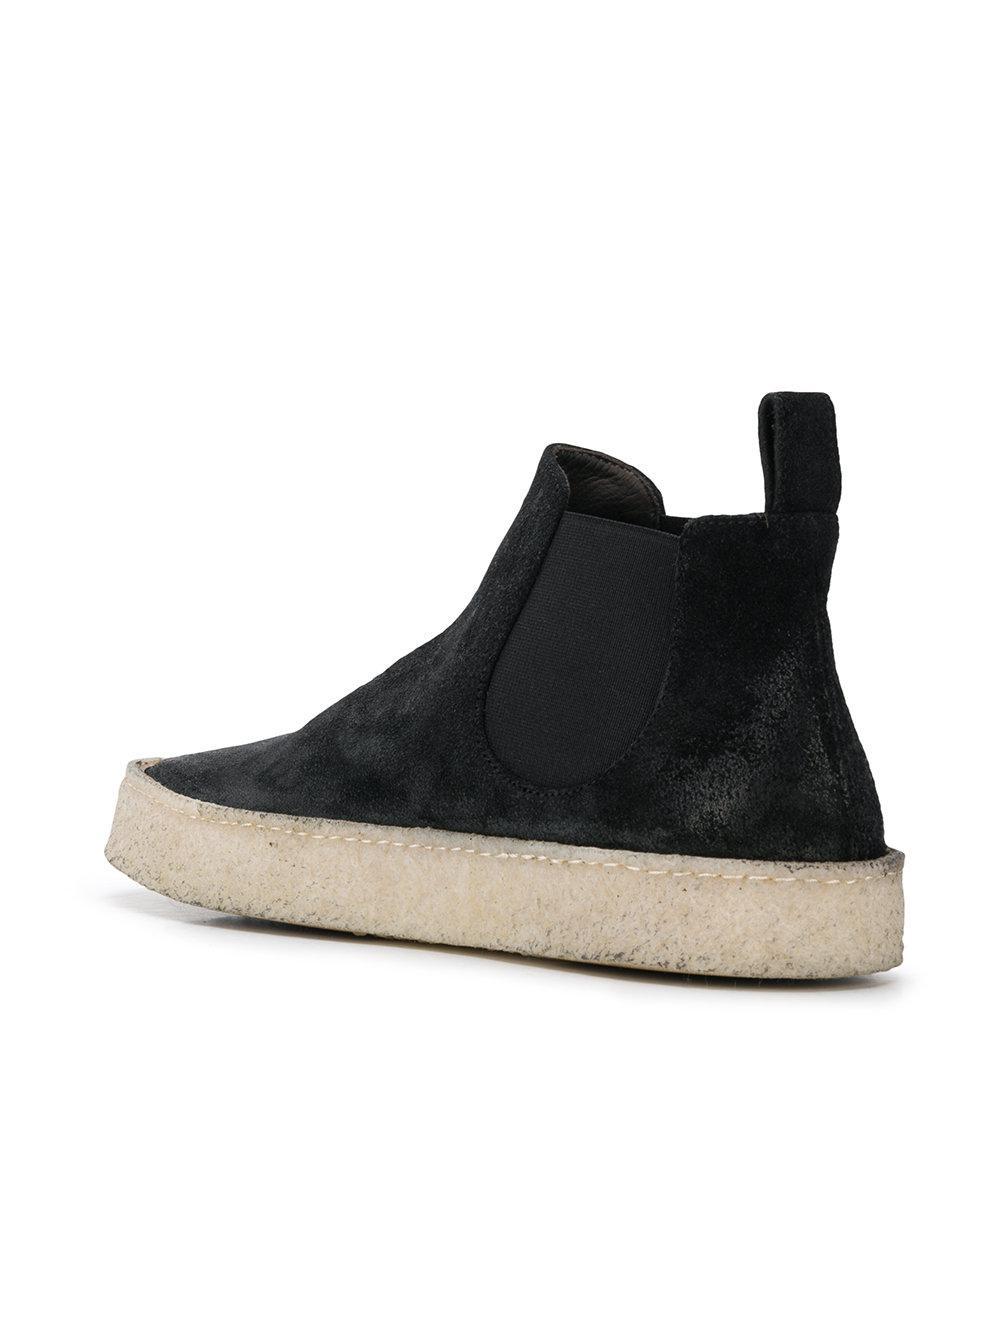 MARSèLL Spallaro boots